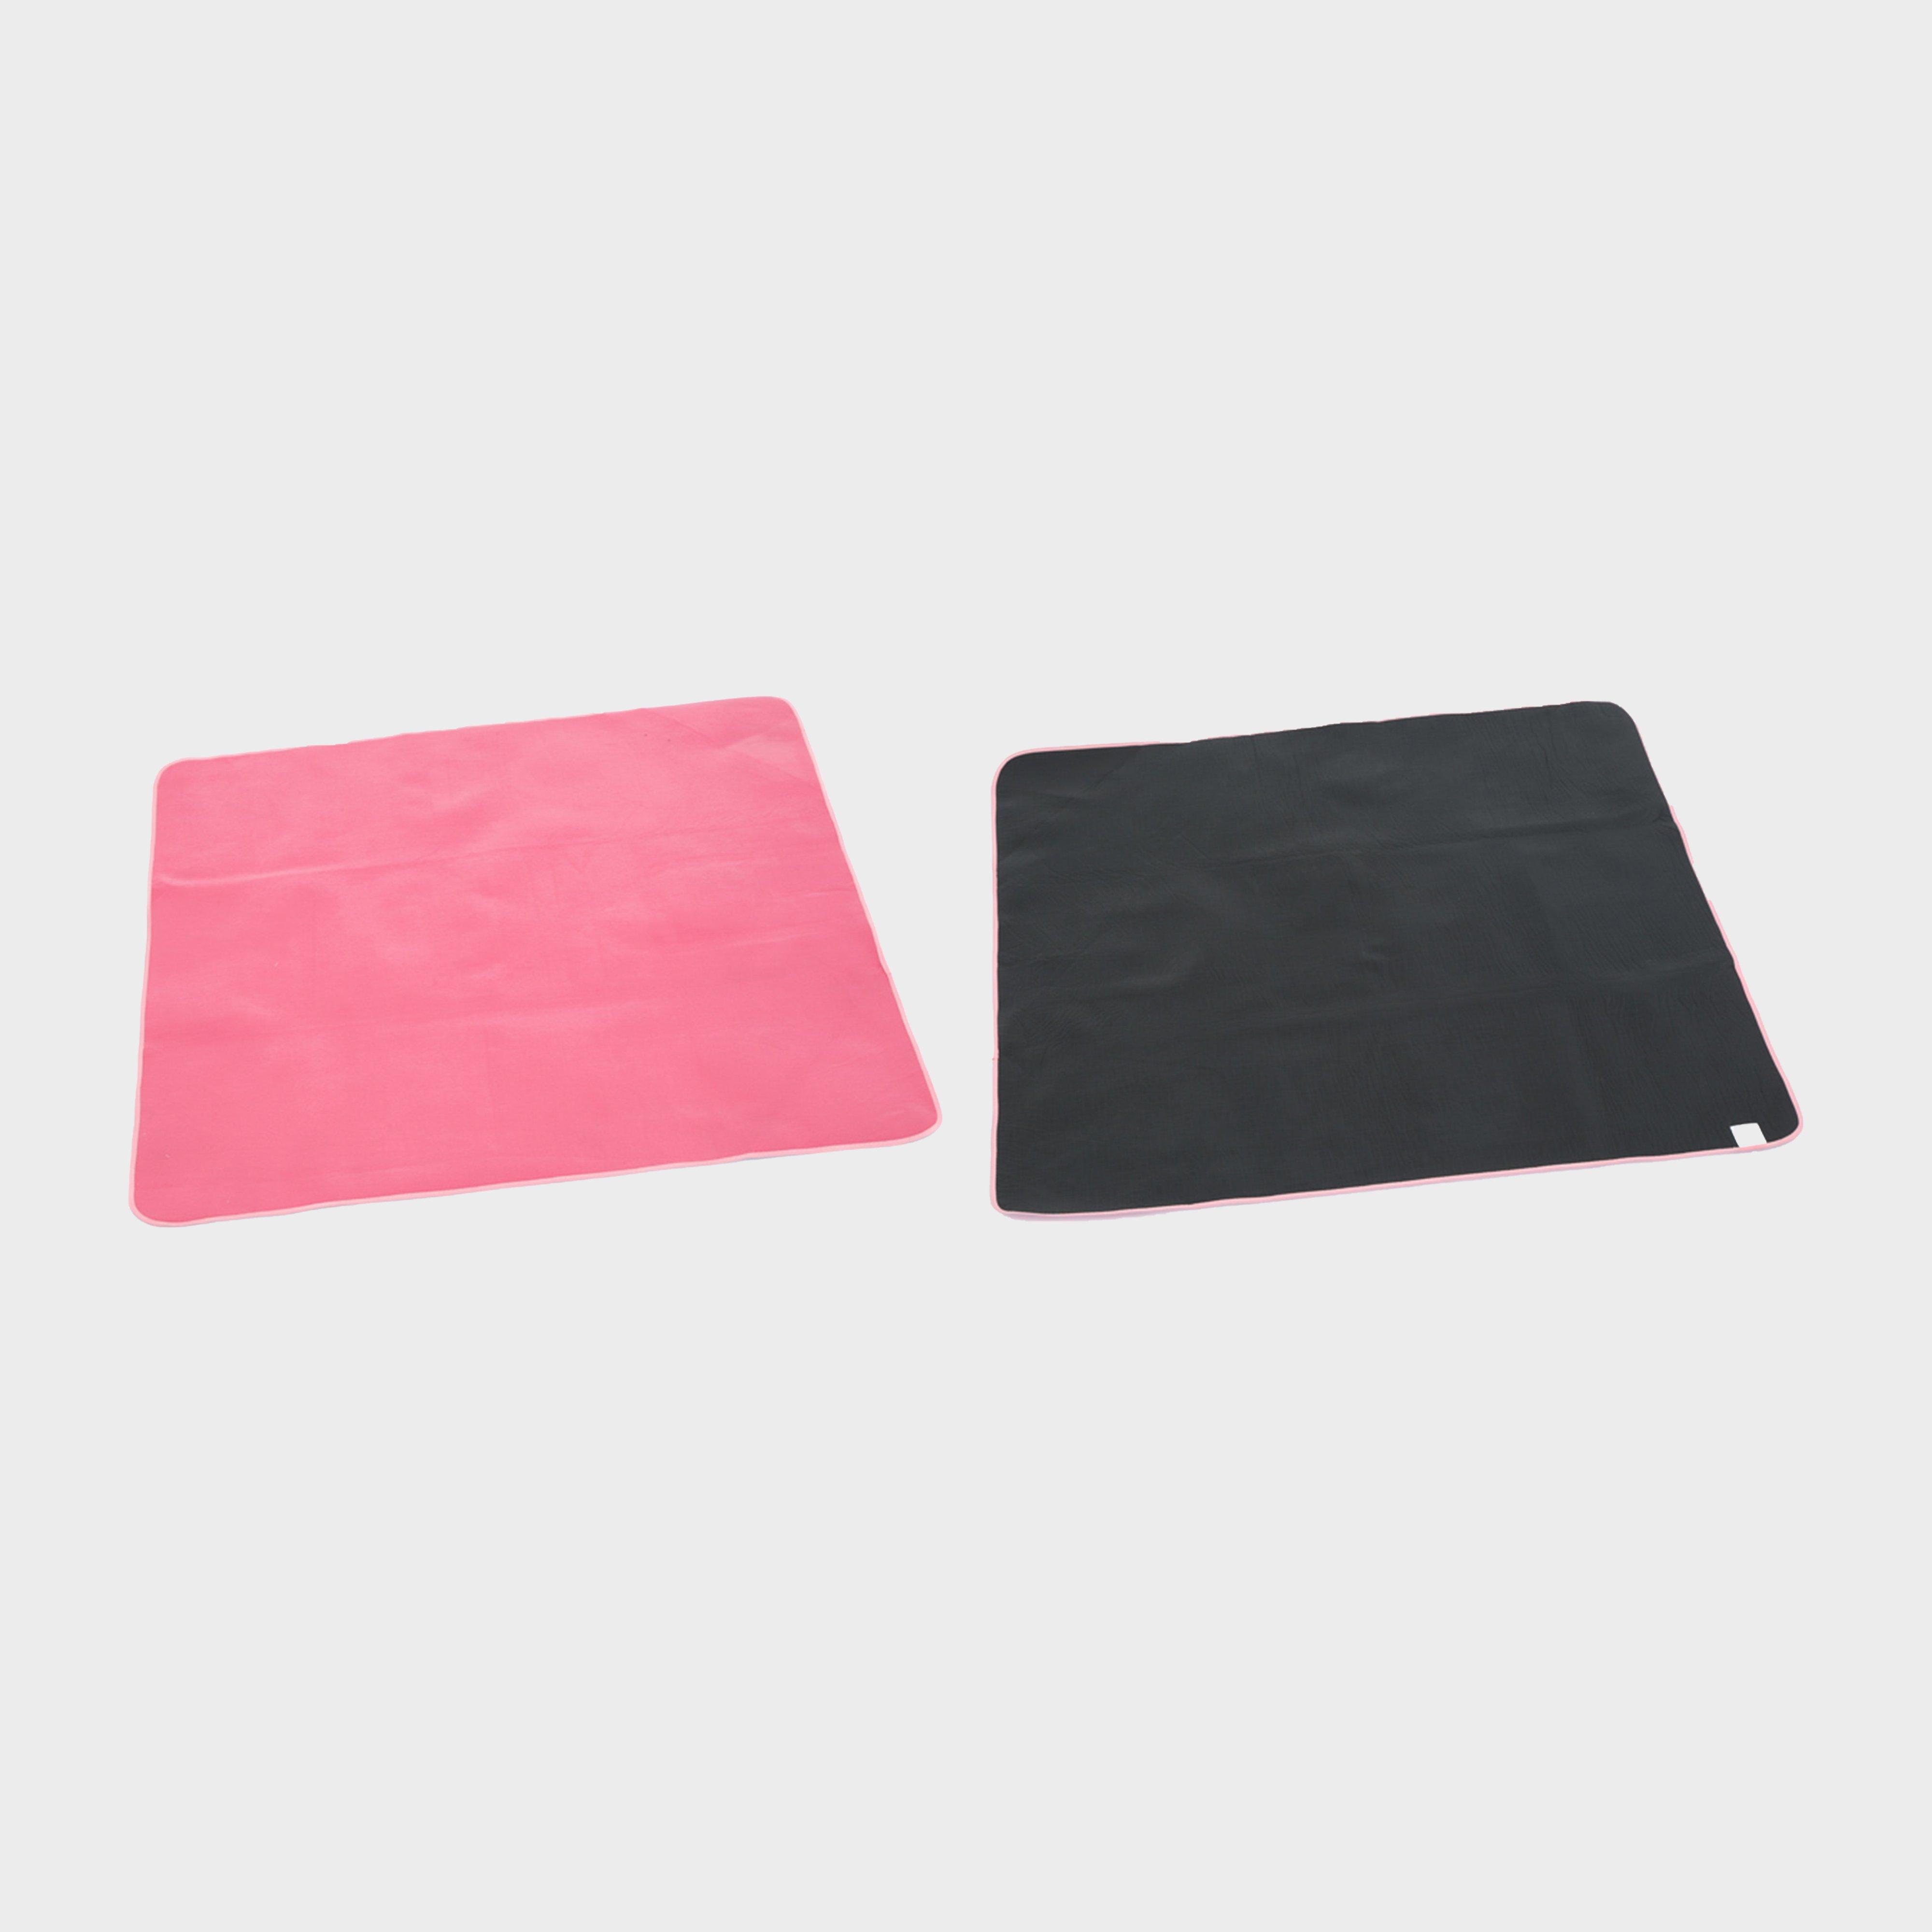 Freedomtrail Carson Fleece Picnic Blanket - Pink/black  Pink/black